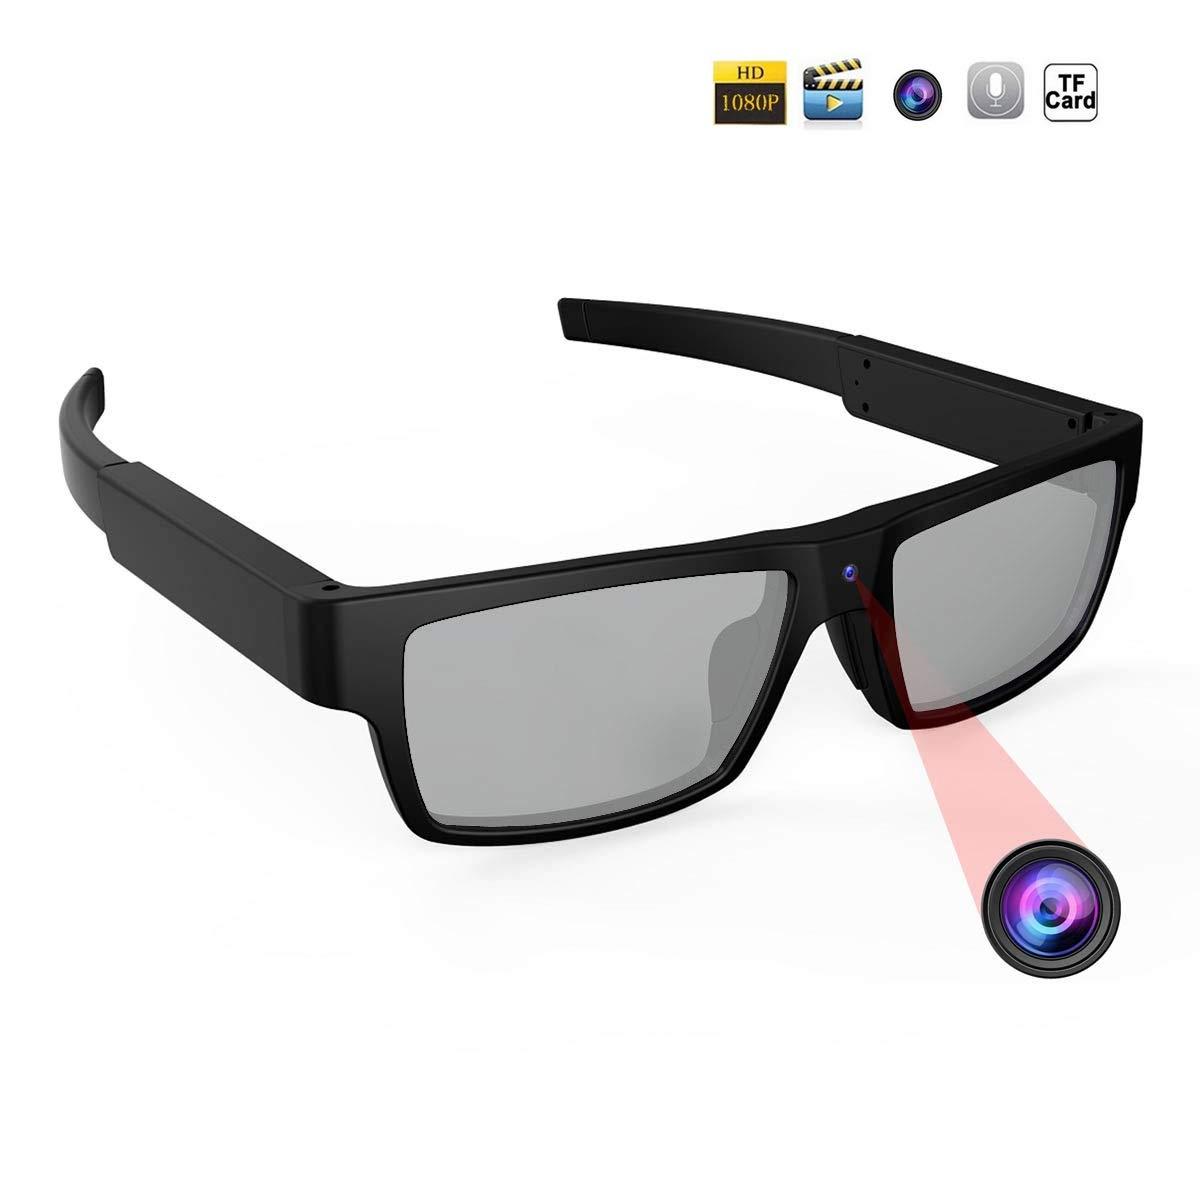 b9ae1e36e44 Amazon.com   HoHoProv SY-G2 Spy Camera Polarized Sunglasses HD 1080P Hidden  Camera Sports Security Camera Built-in 16GB Card